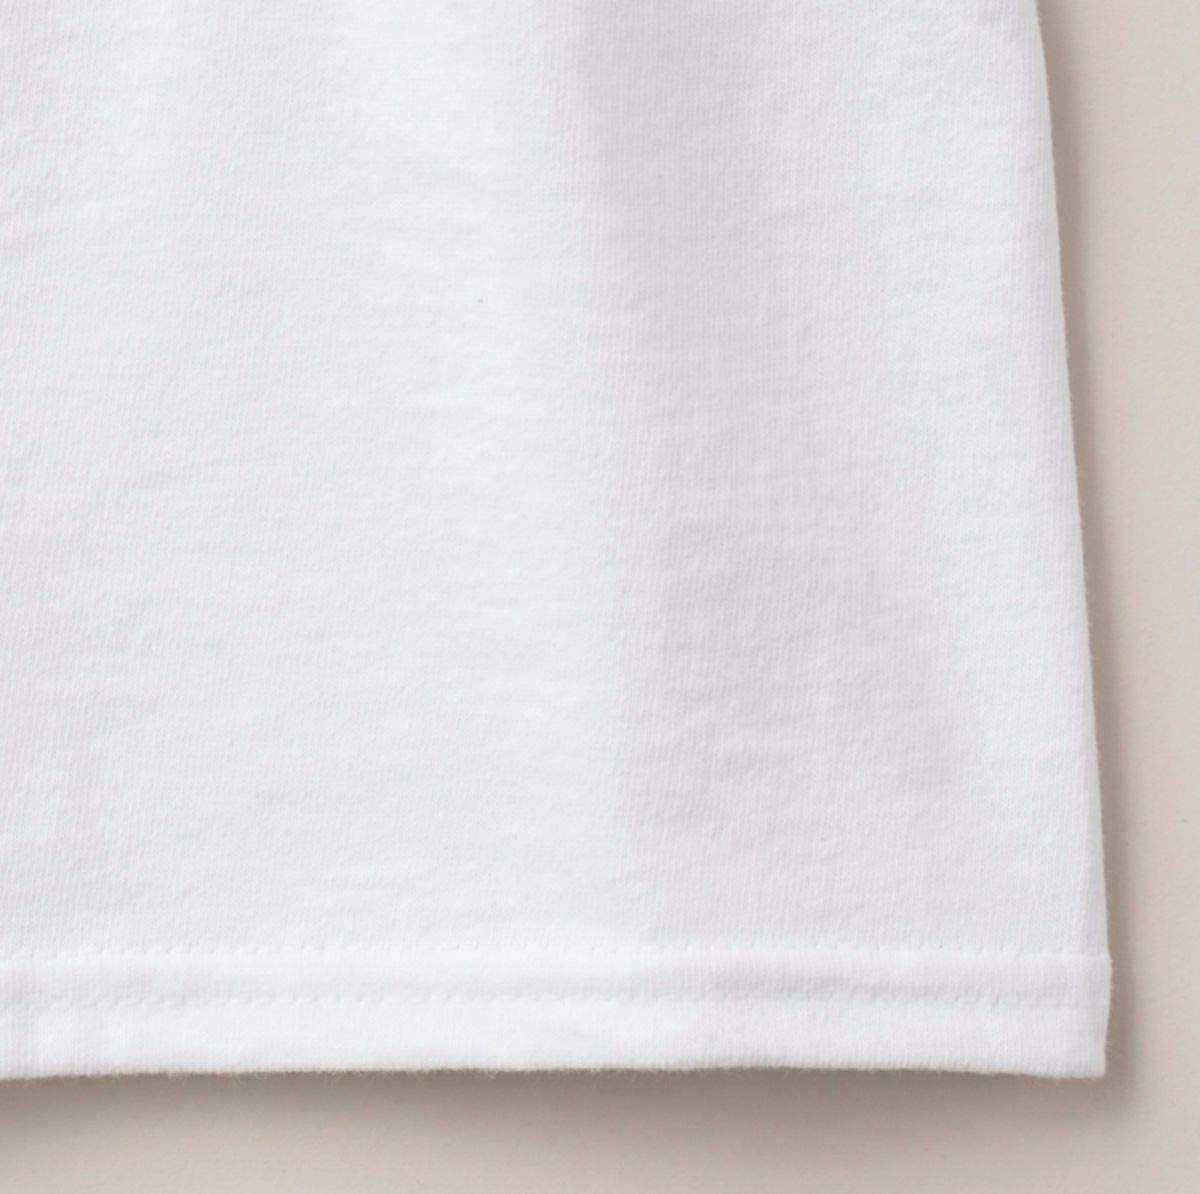 FOECBIR Nurse Hair Dont Care Infant Sleeveless Bodysuit Umpsuit Cotton for Baby Girl